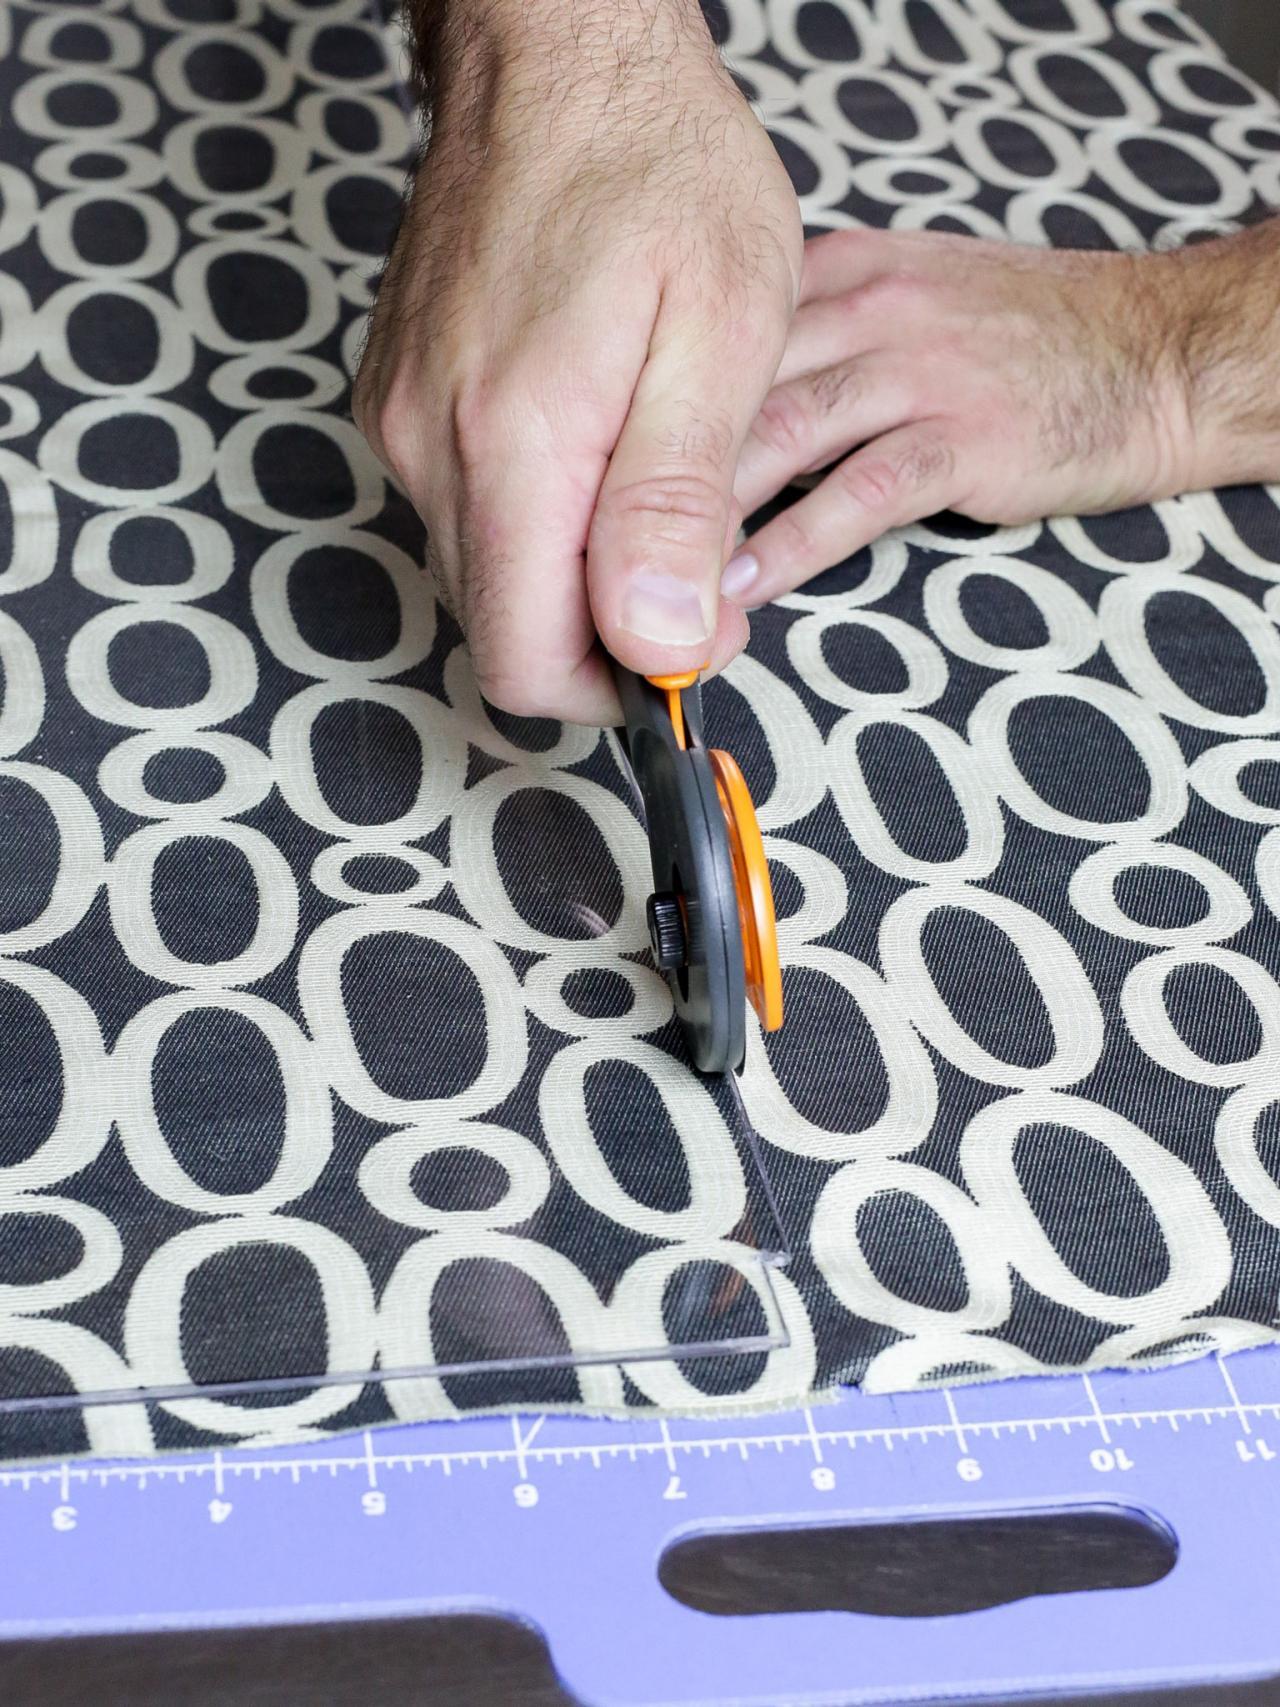 make a renter friendly removable diy kitchen backsplash hgtv cut fabric to height